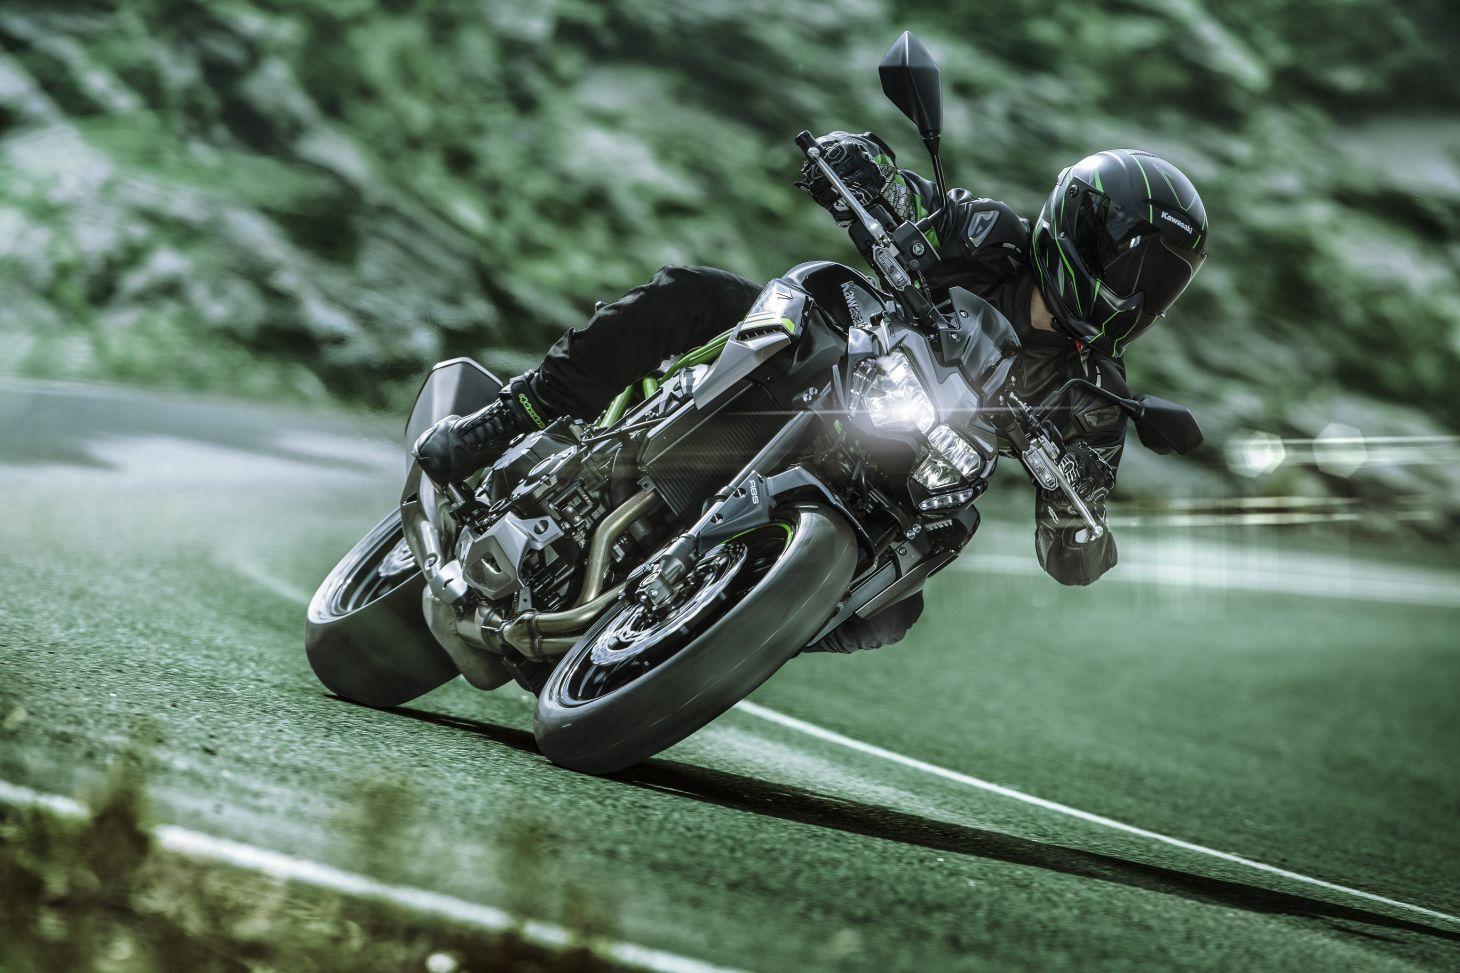 Kawasaki Z 900 2021 preta em movimento